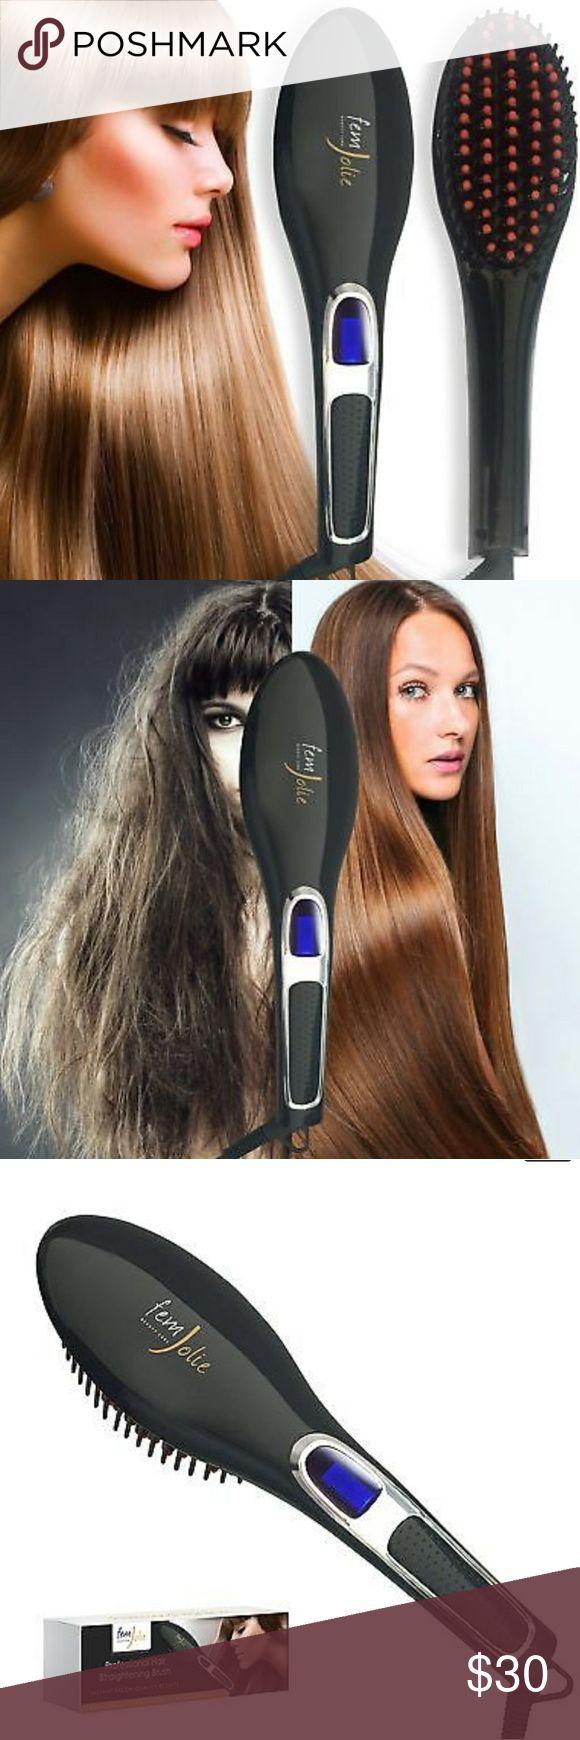 Farouk turbo inch ceramic flat iron p 46 - Gem Jolie Hair Straightening Brush Boutique